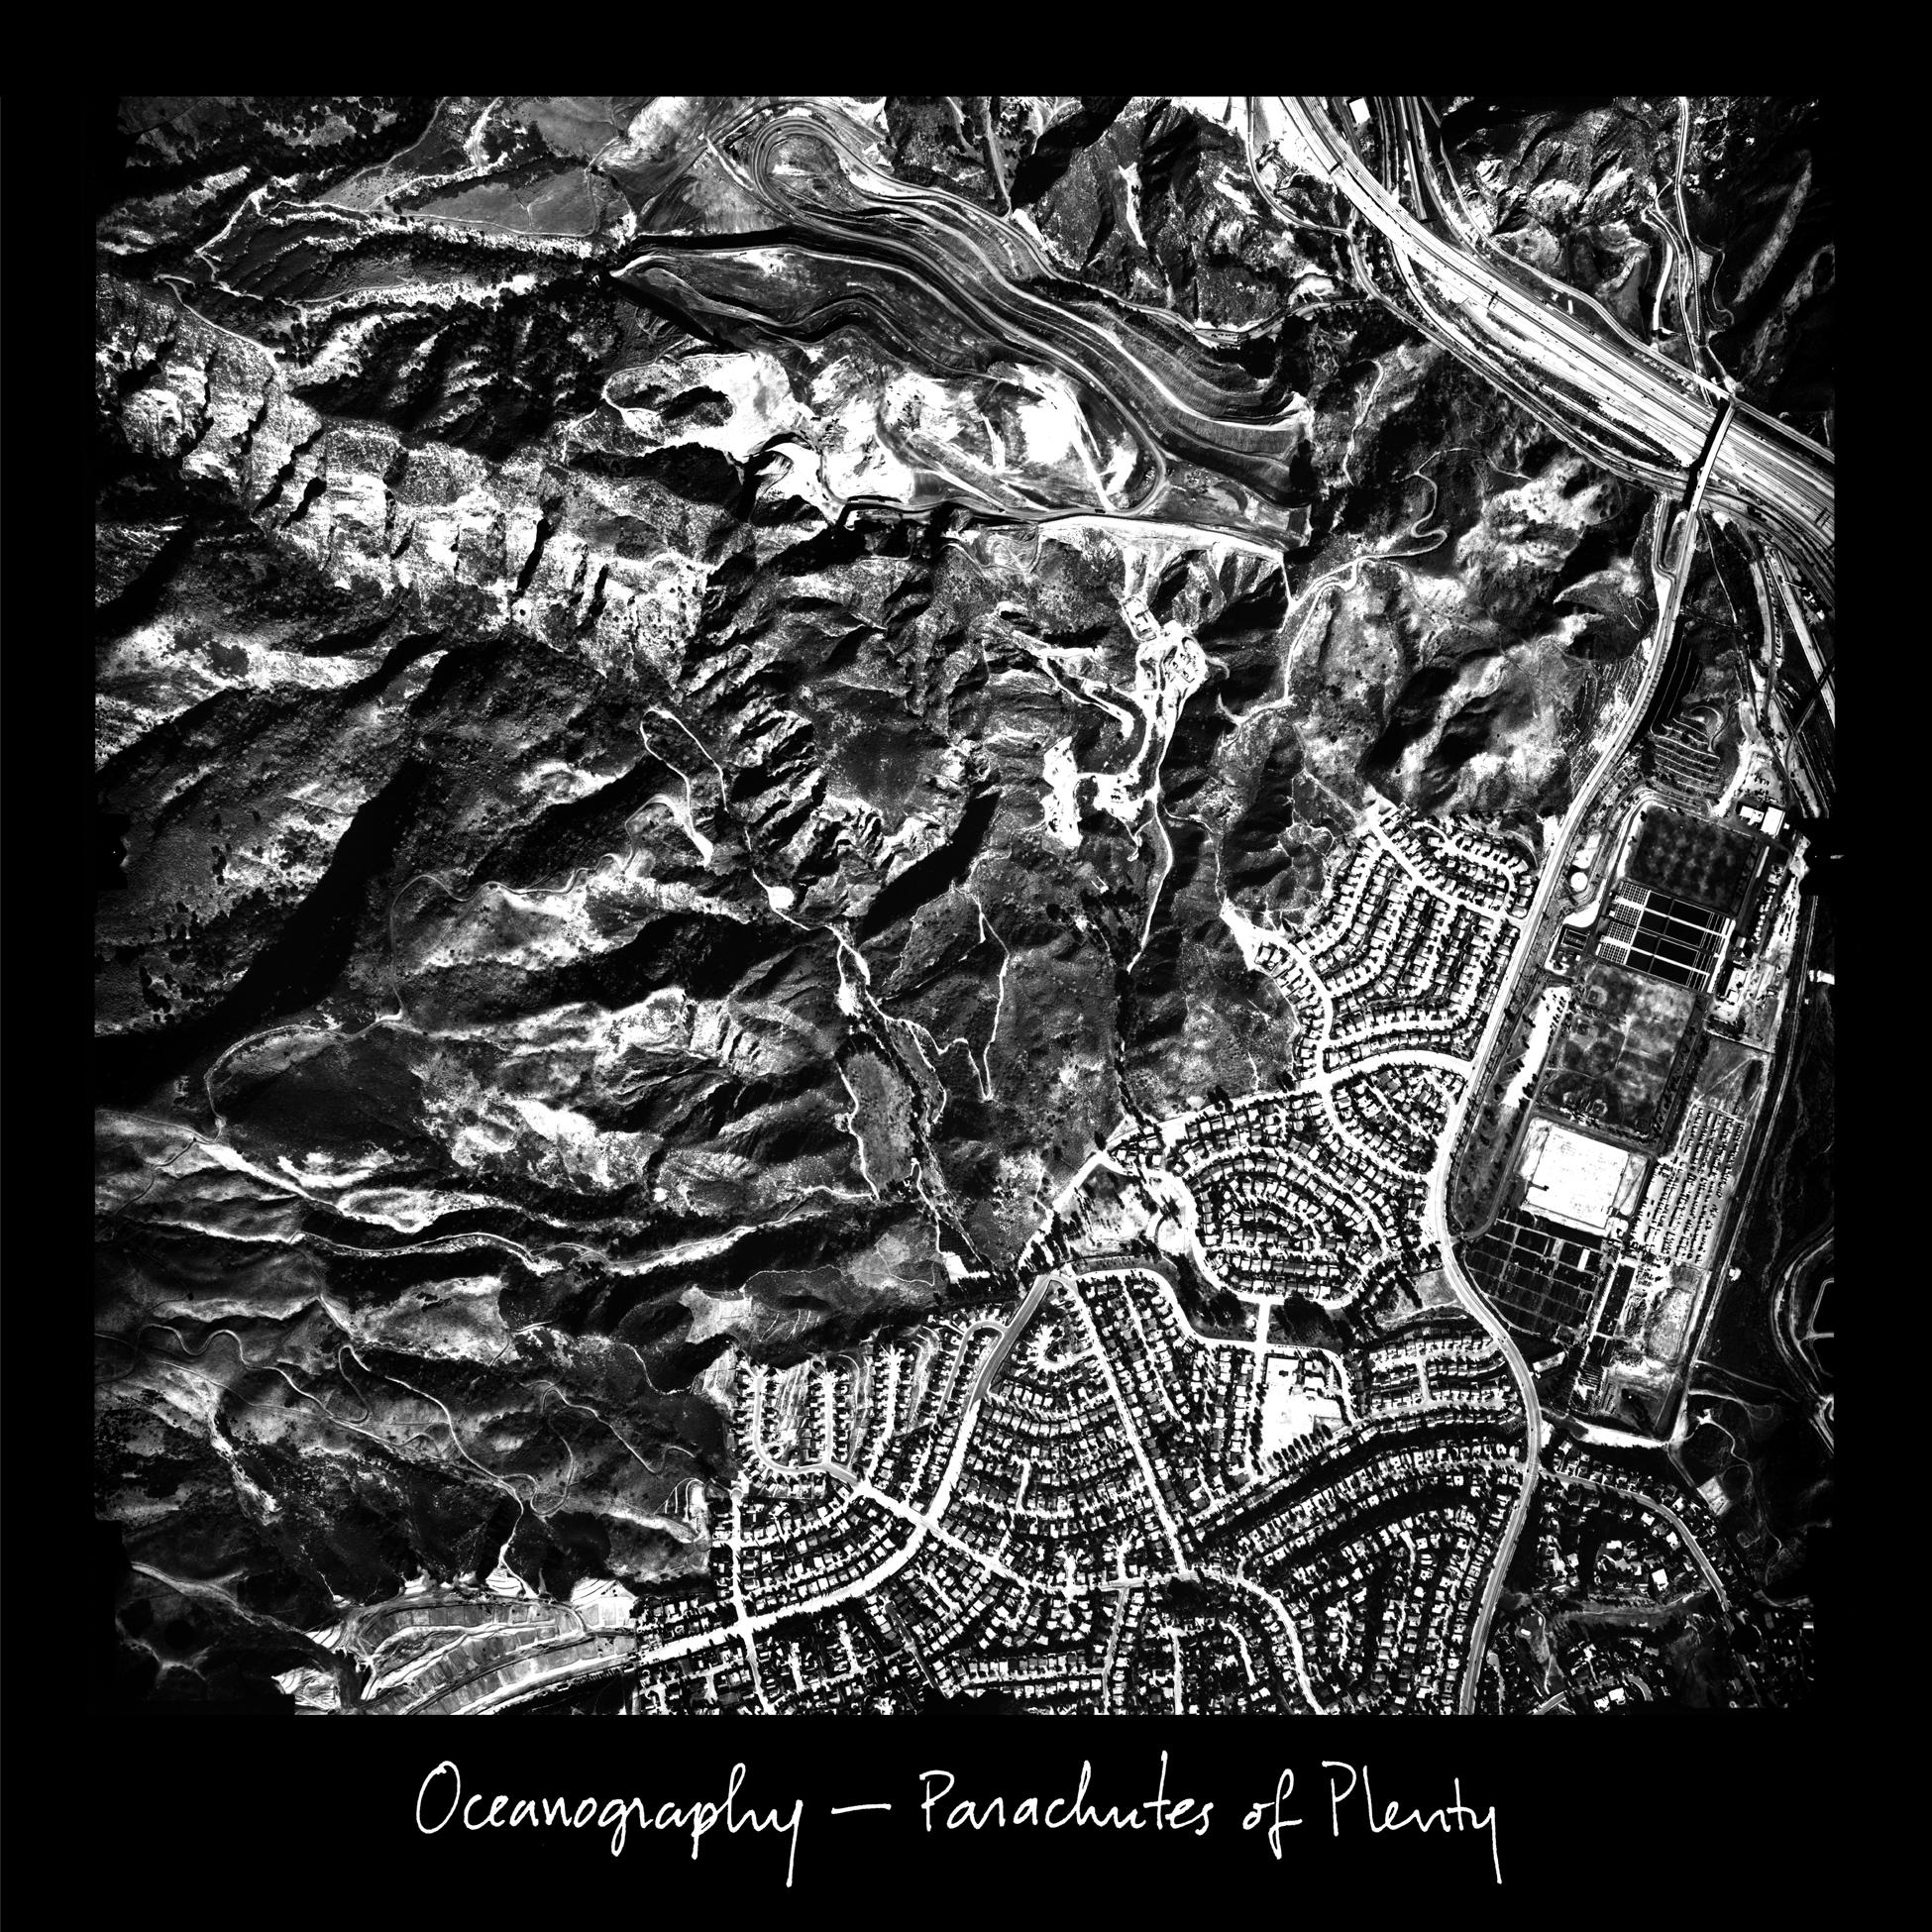 Oceanography-Parachutes-of-Plenty